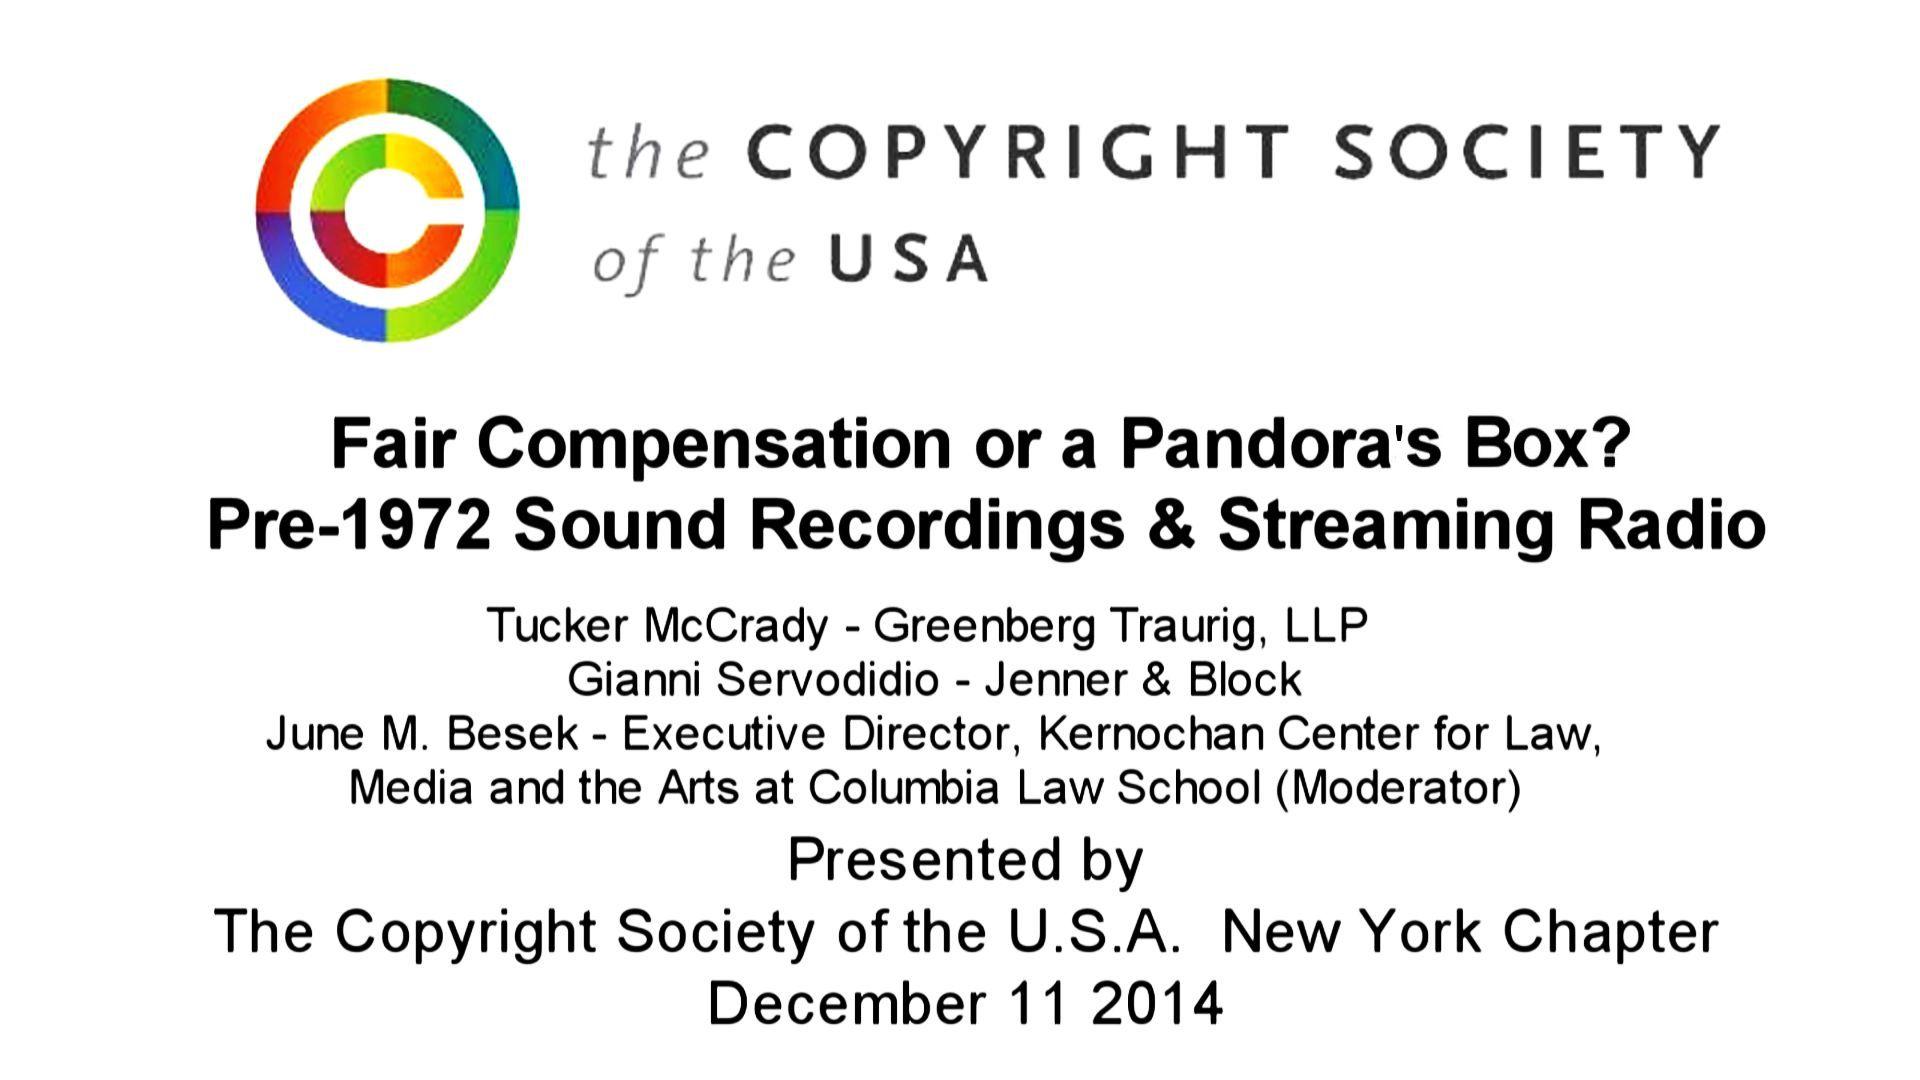 CSUSA - Fair Compensation or a Pandora's Box? Pre-1972 Sound Recordings & Streaming Radio - December 11 2014